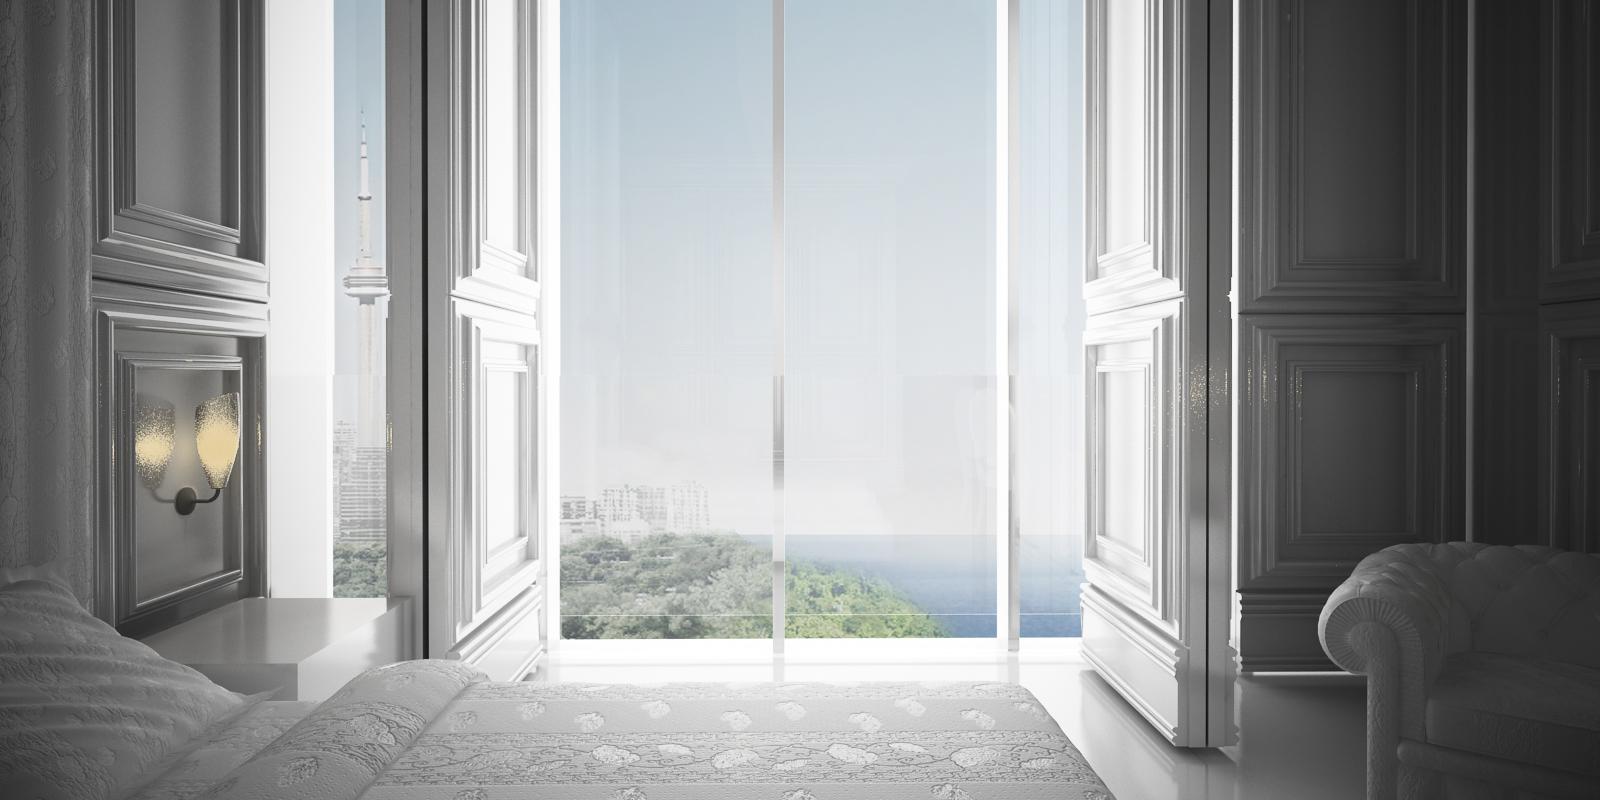 CNE Hotel - Interior window bedroom lake view